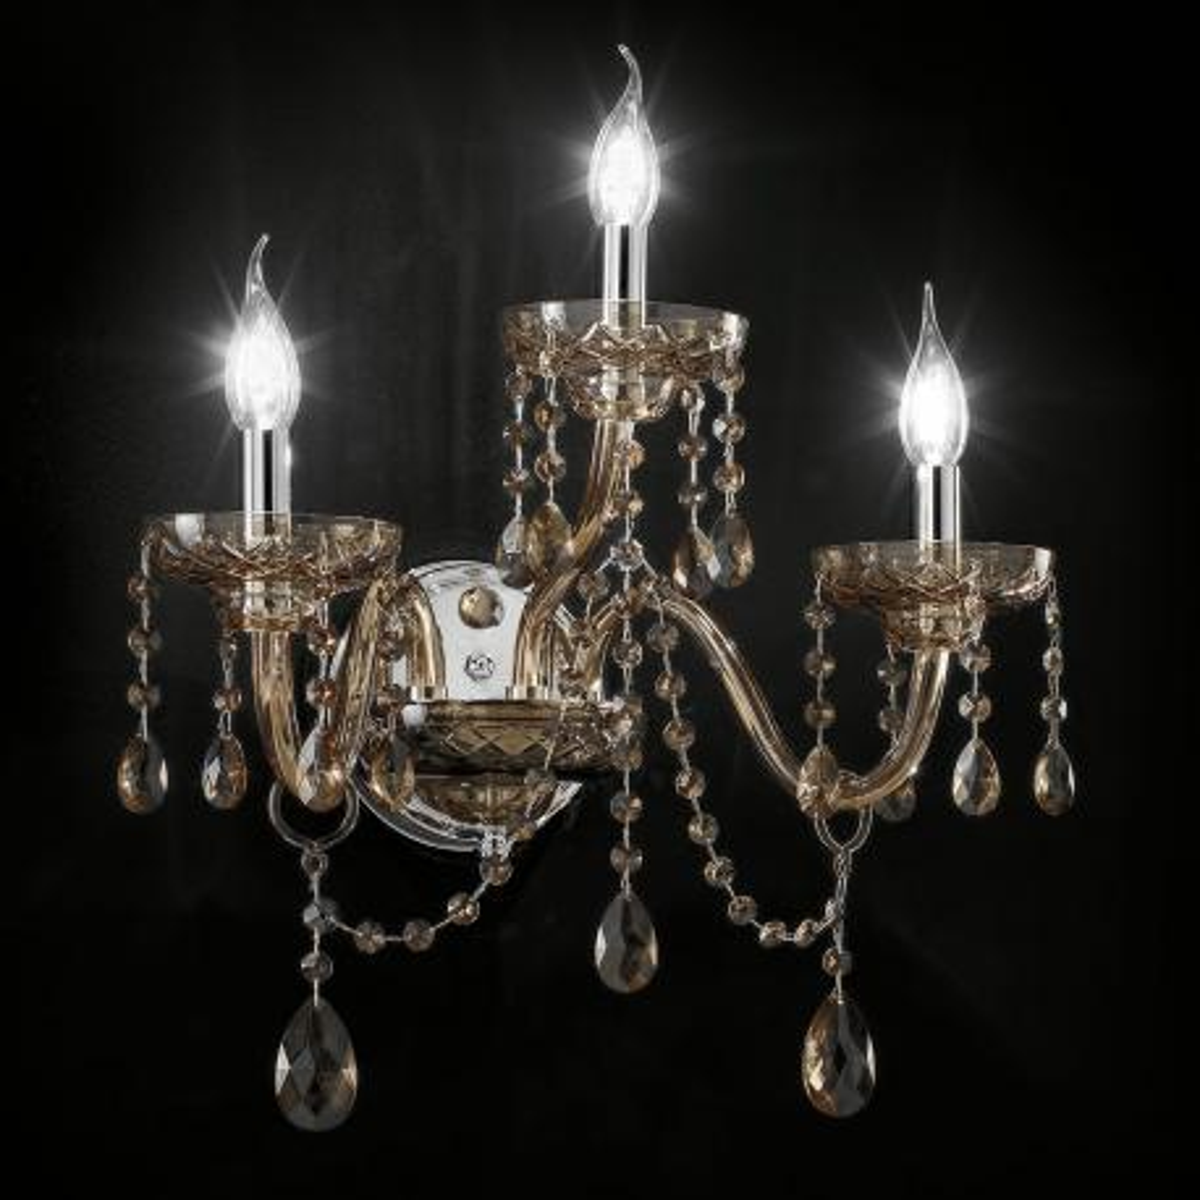 """Cimabue"" aplique veneciano de pared en cristal - 2+1 luces - cristal Asfour"